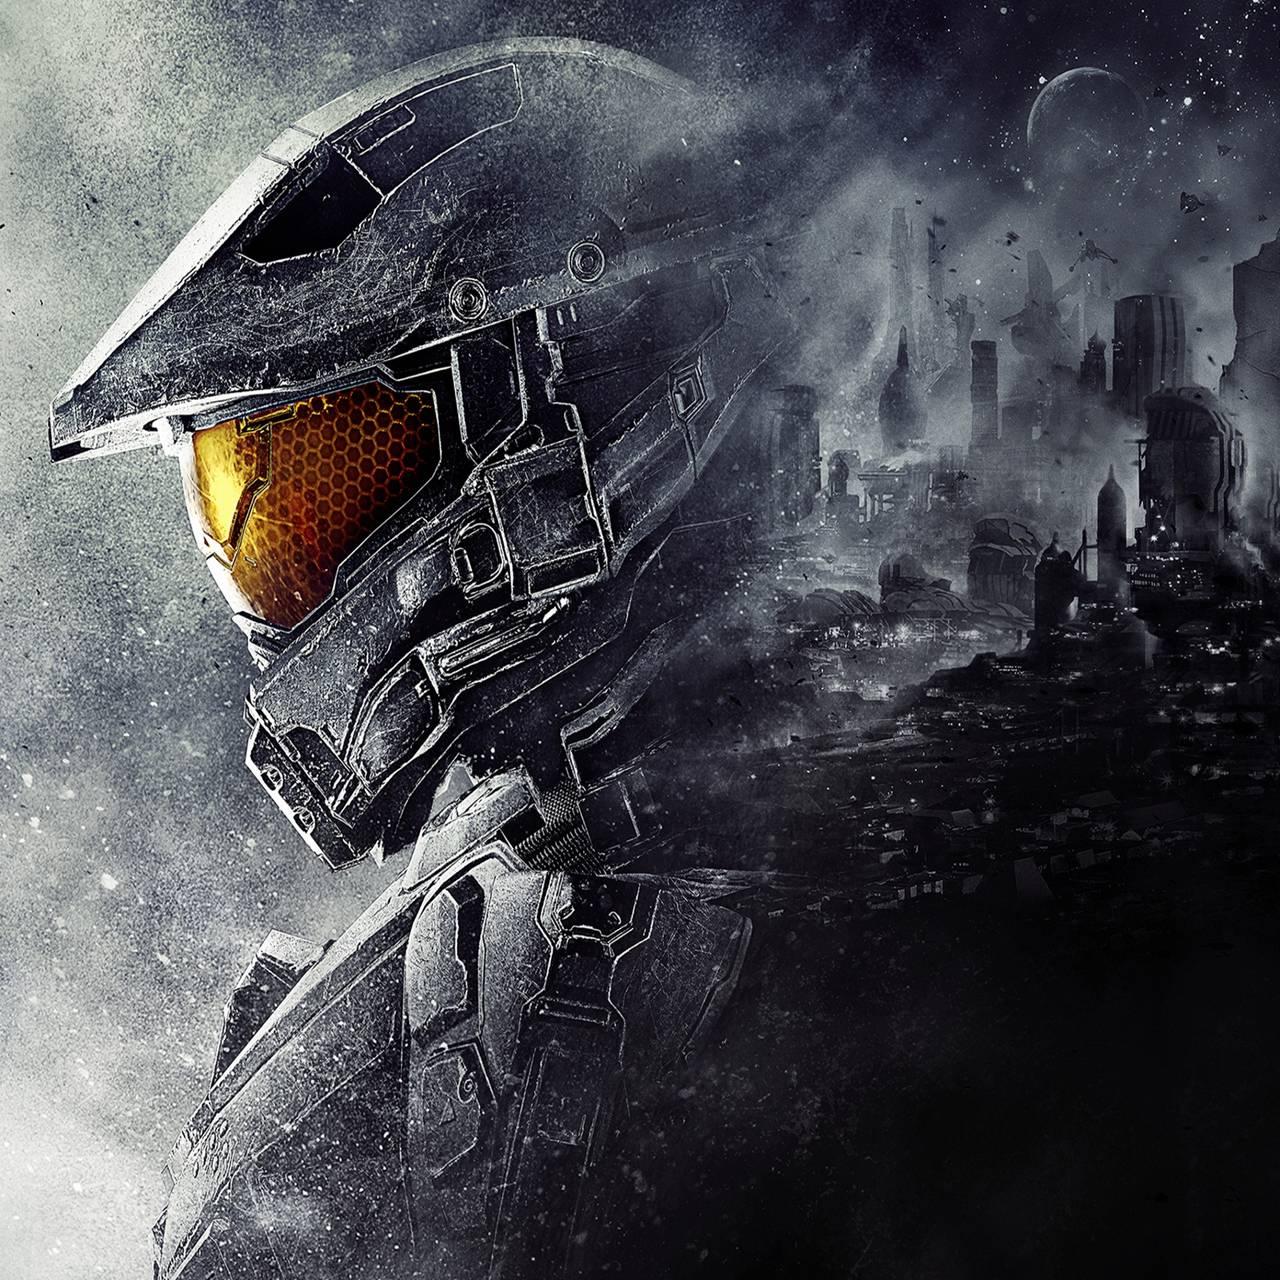 Halo 5 Mastier Chief